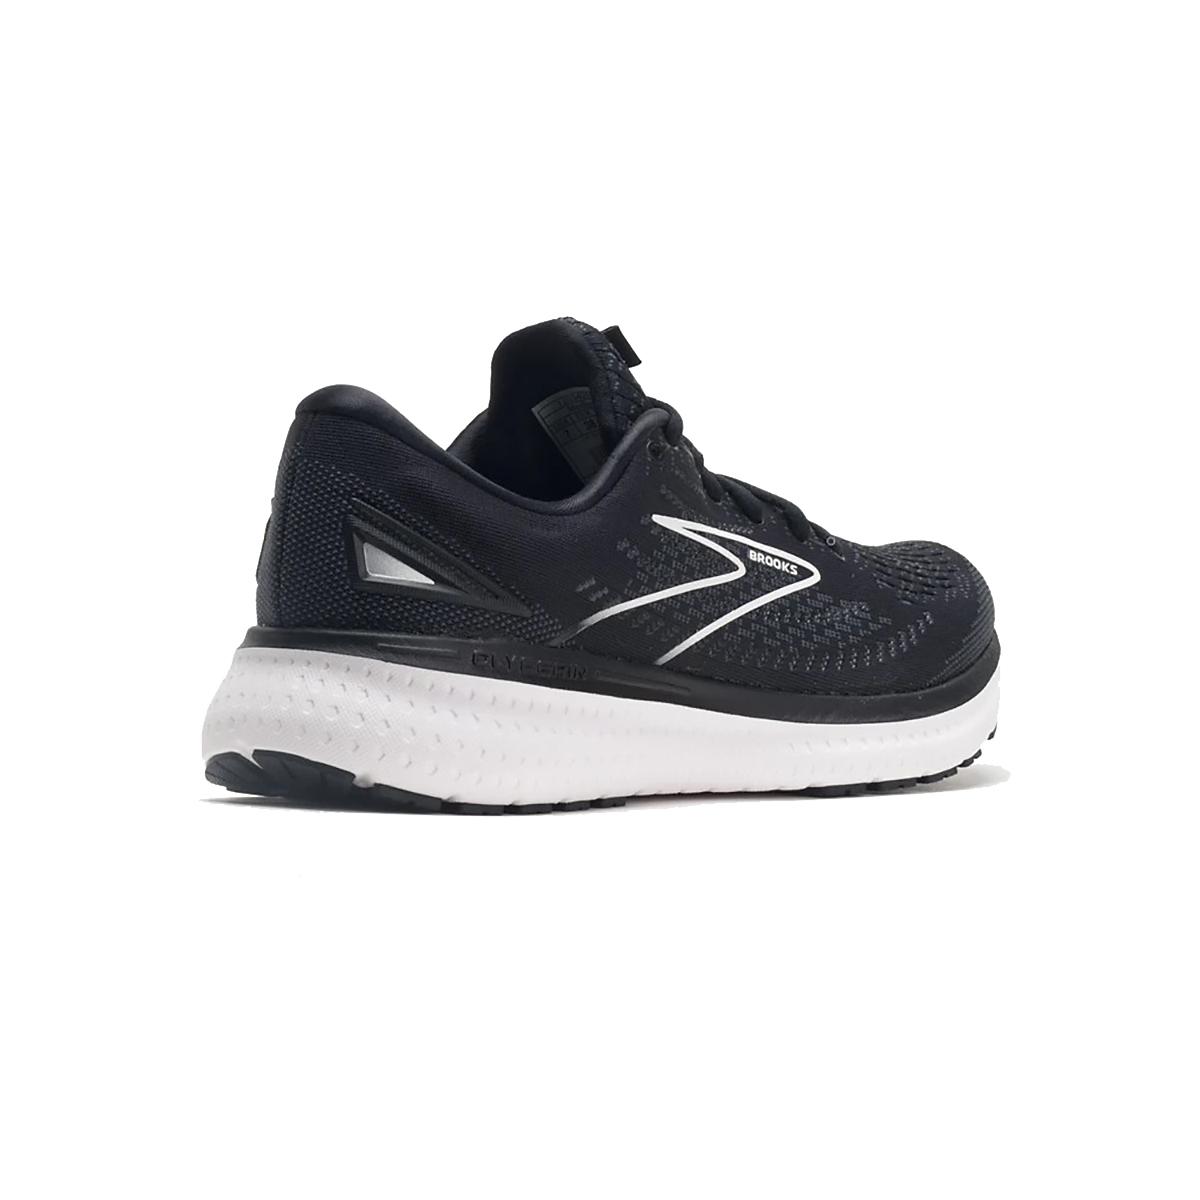 Men's Brooks Glycerin 19 Running Shoe - Color: Black/White - Size: 7 - Width: Regular, Black/White, large, image 4